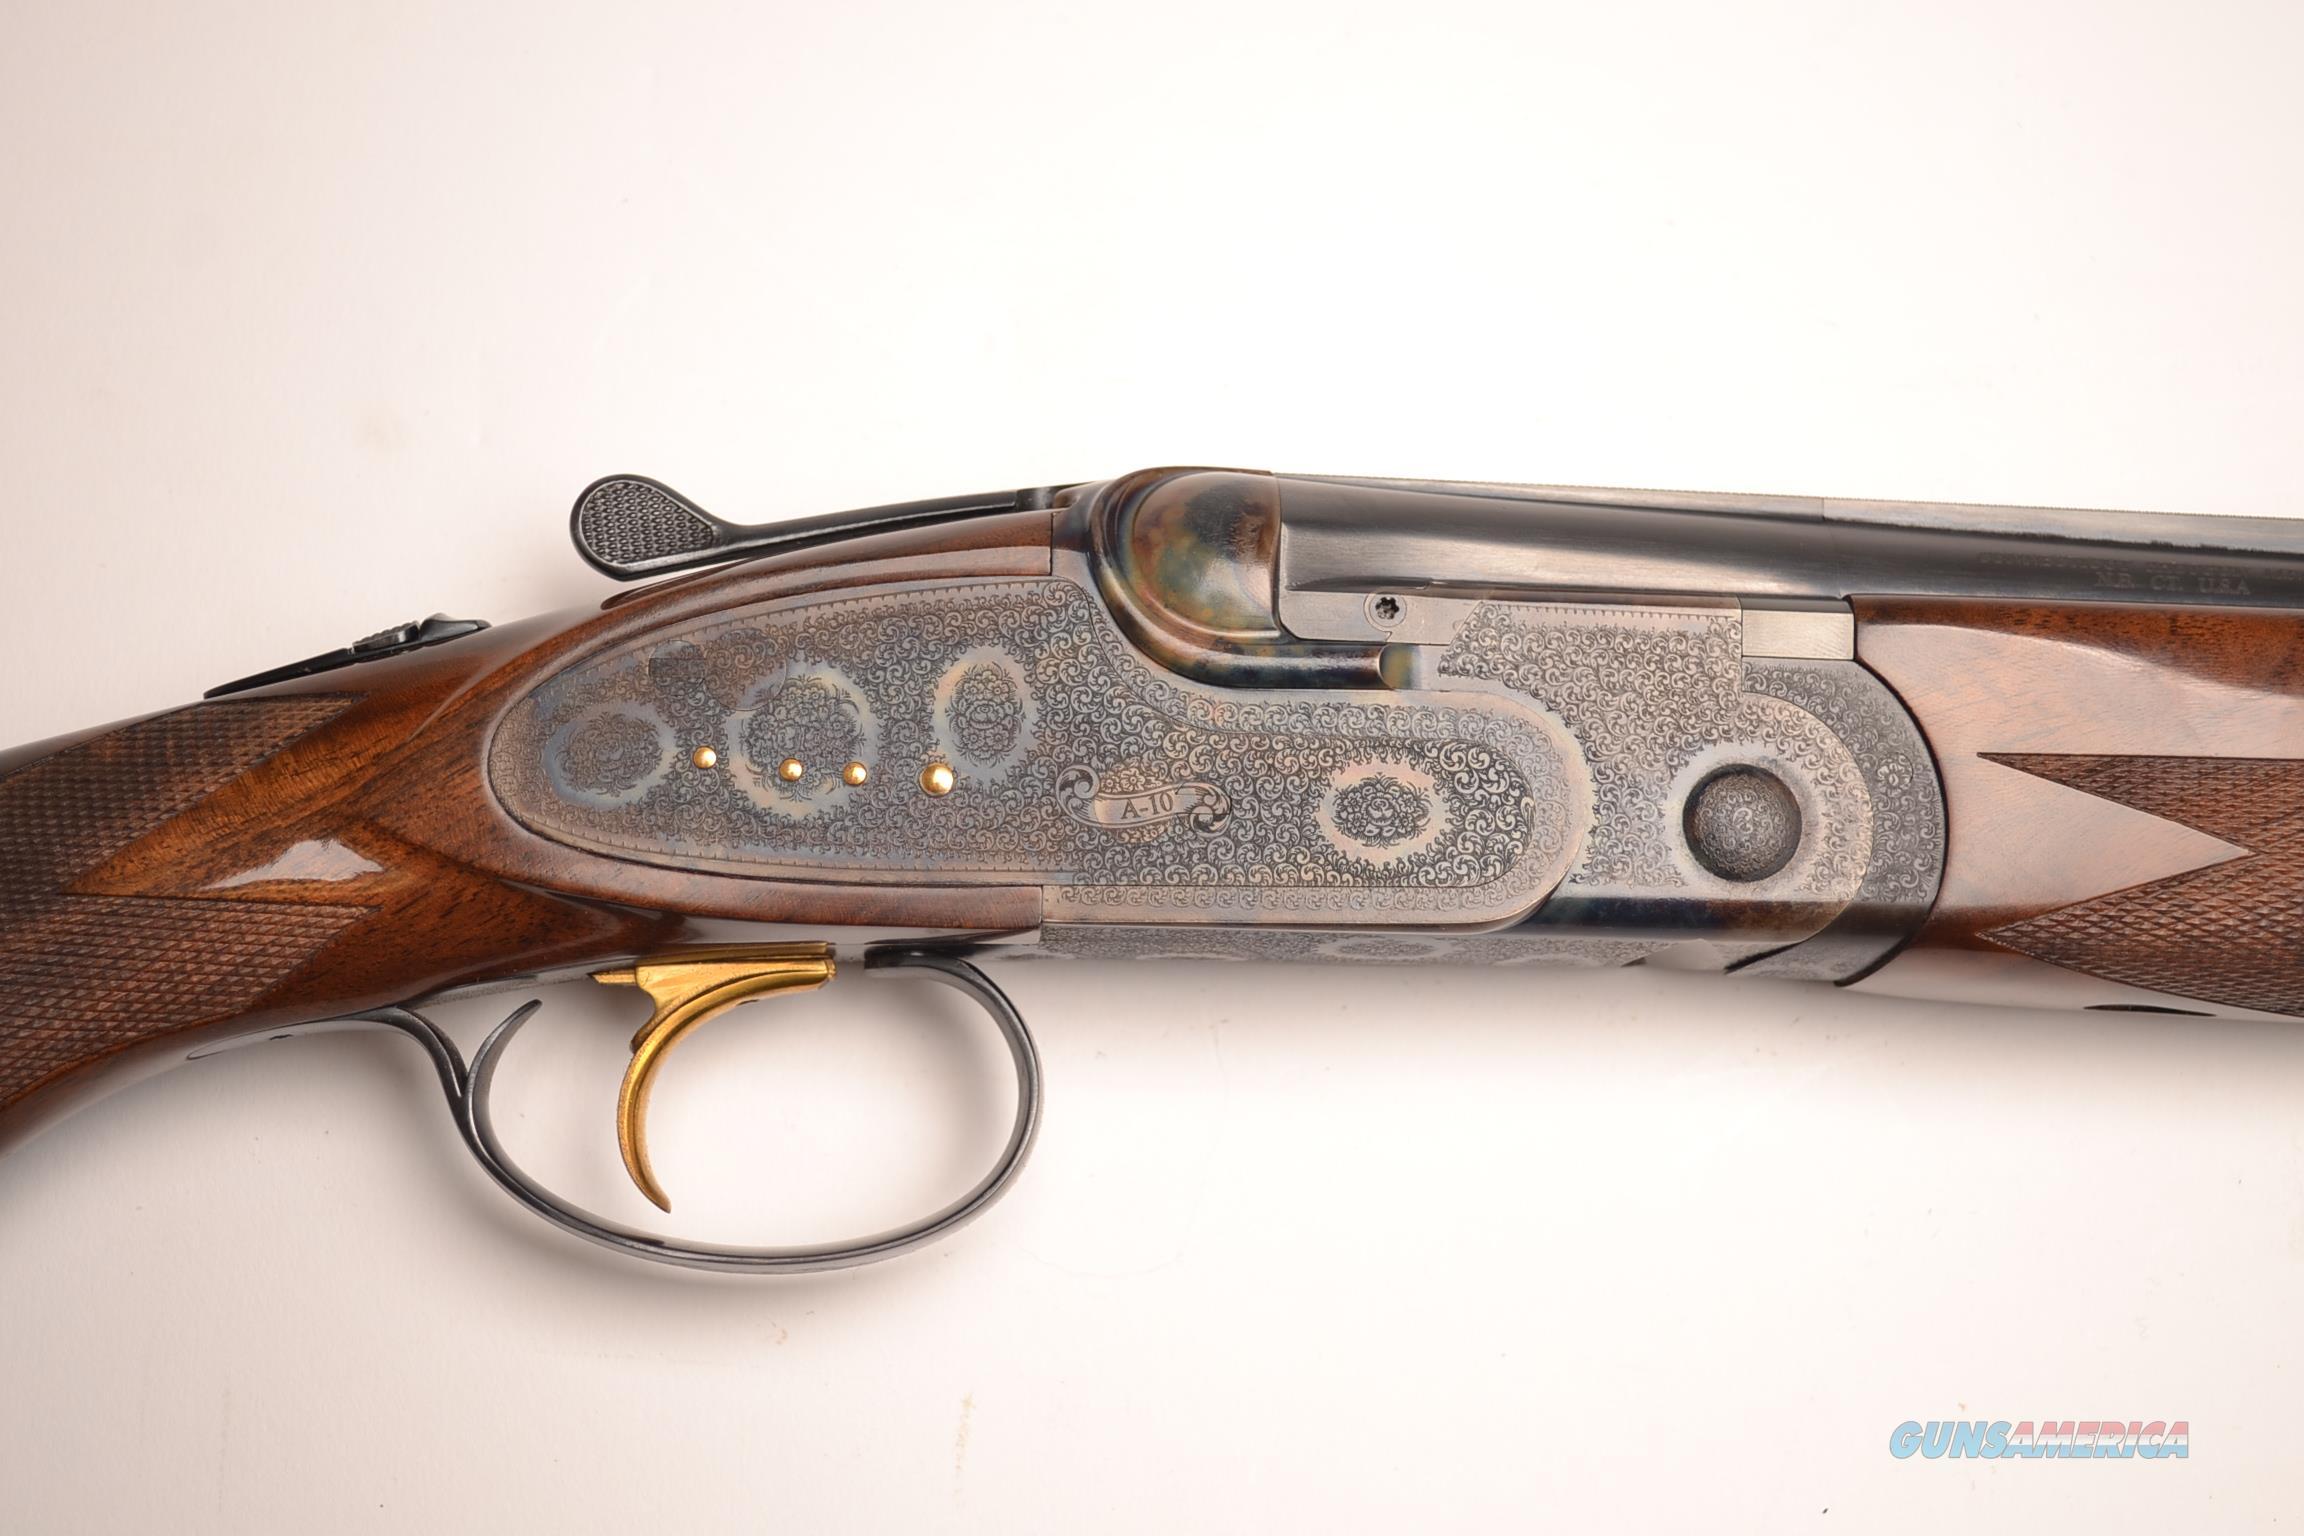 CSMC - A10 Rose & Scroll  Guns > Shotguns > Connecticut (Galazan) Shotguns